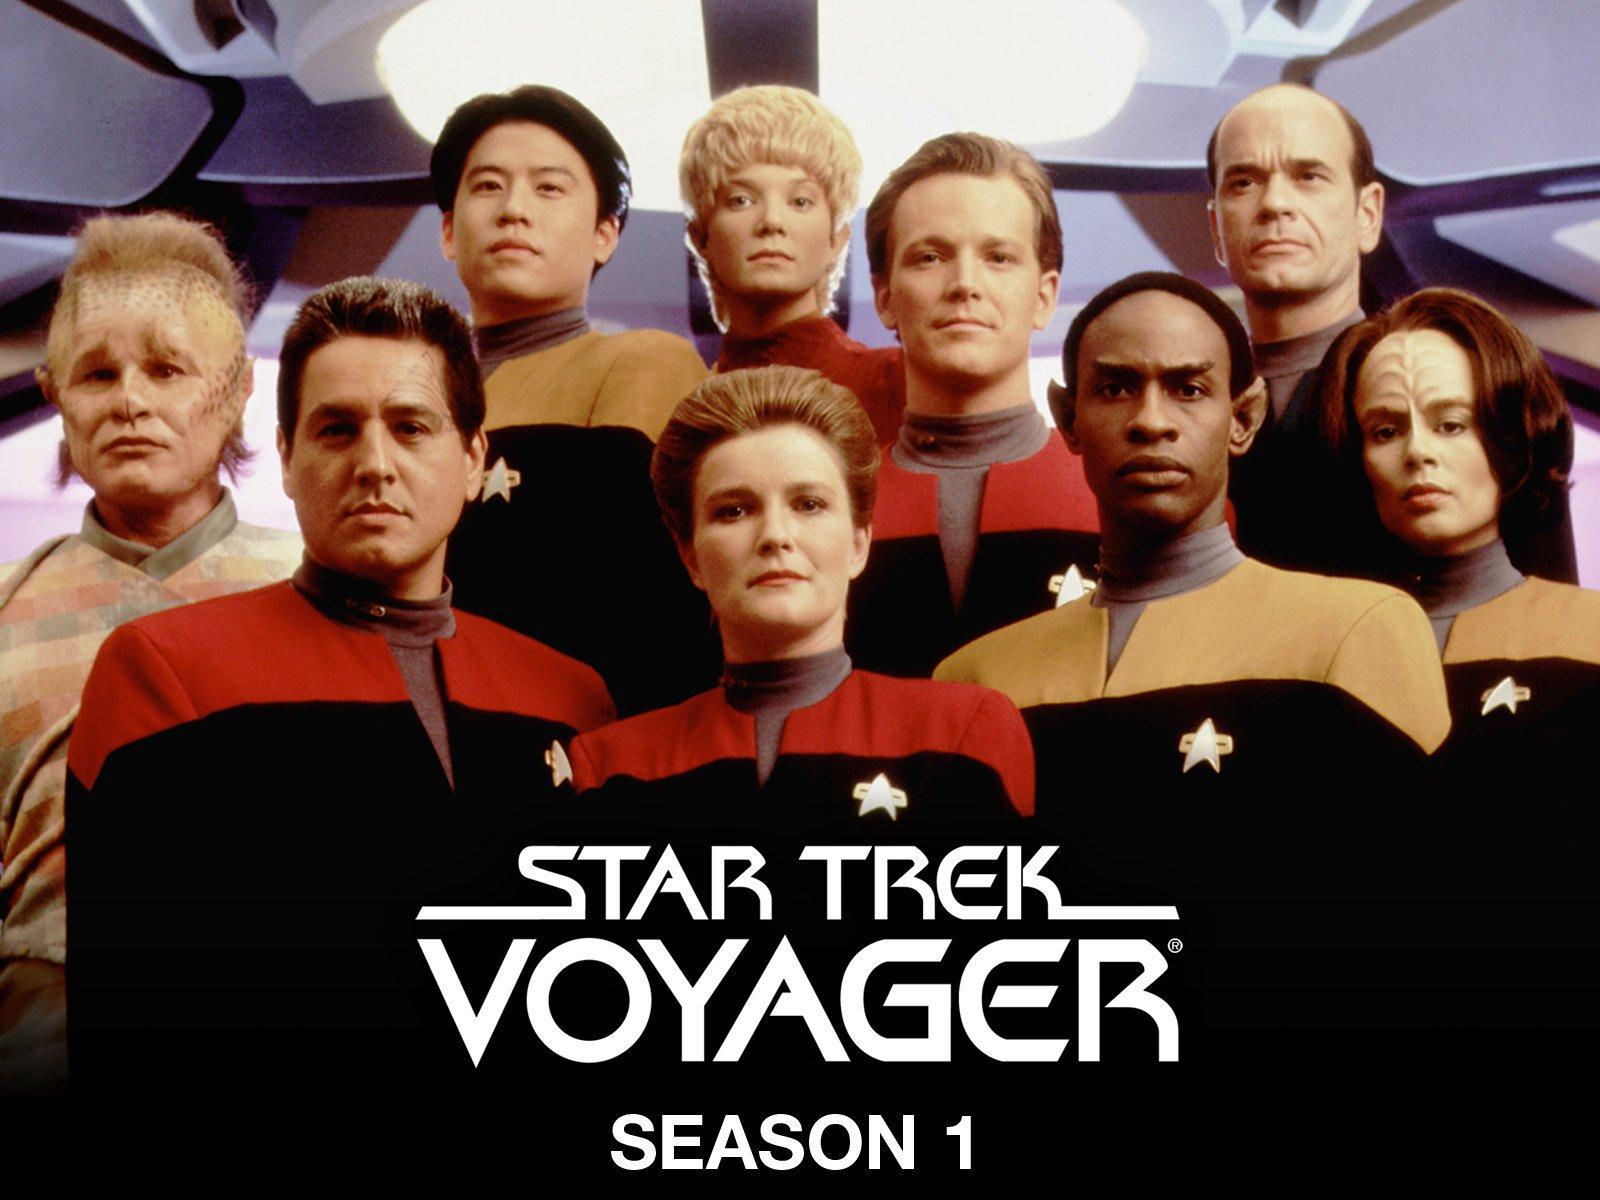 star trek the next generation season 1 episode 1 download